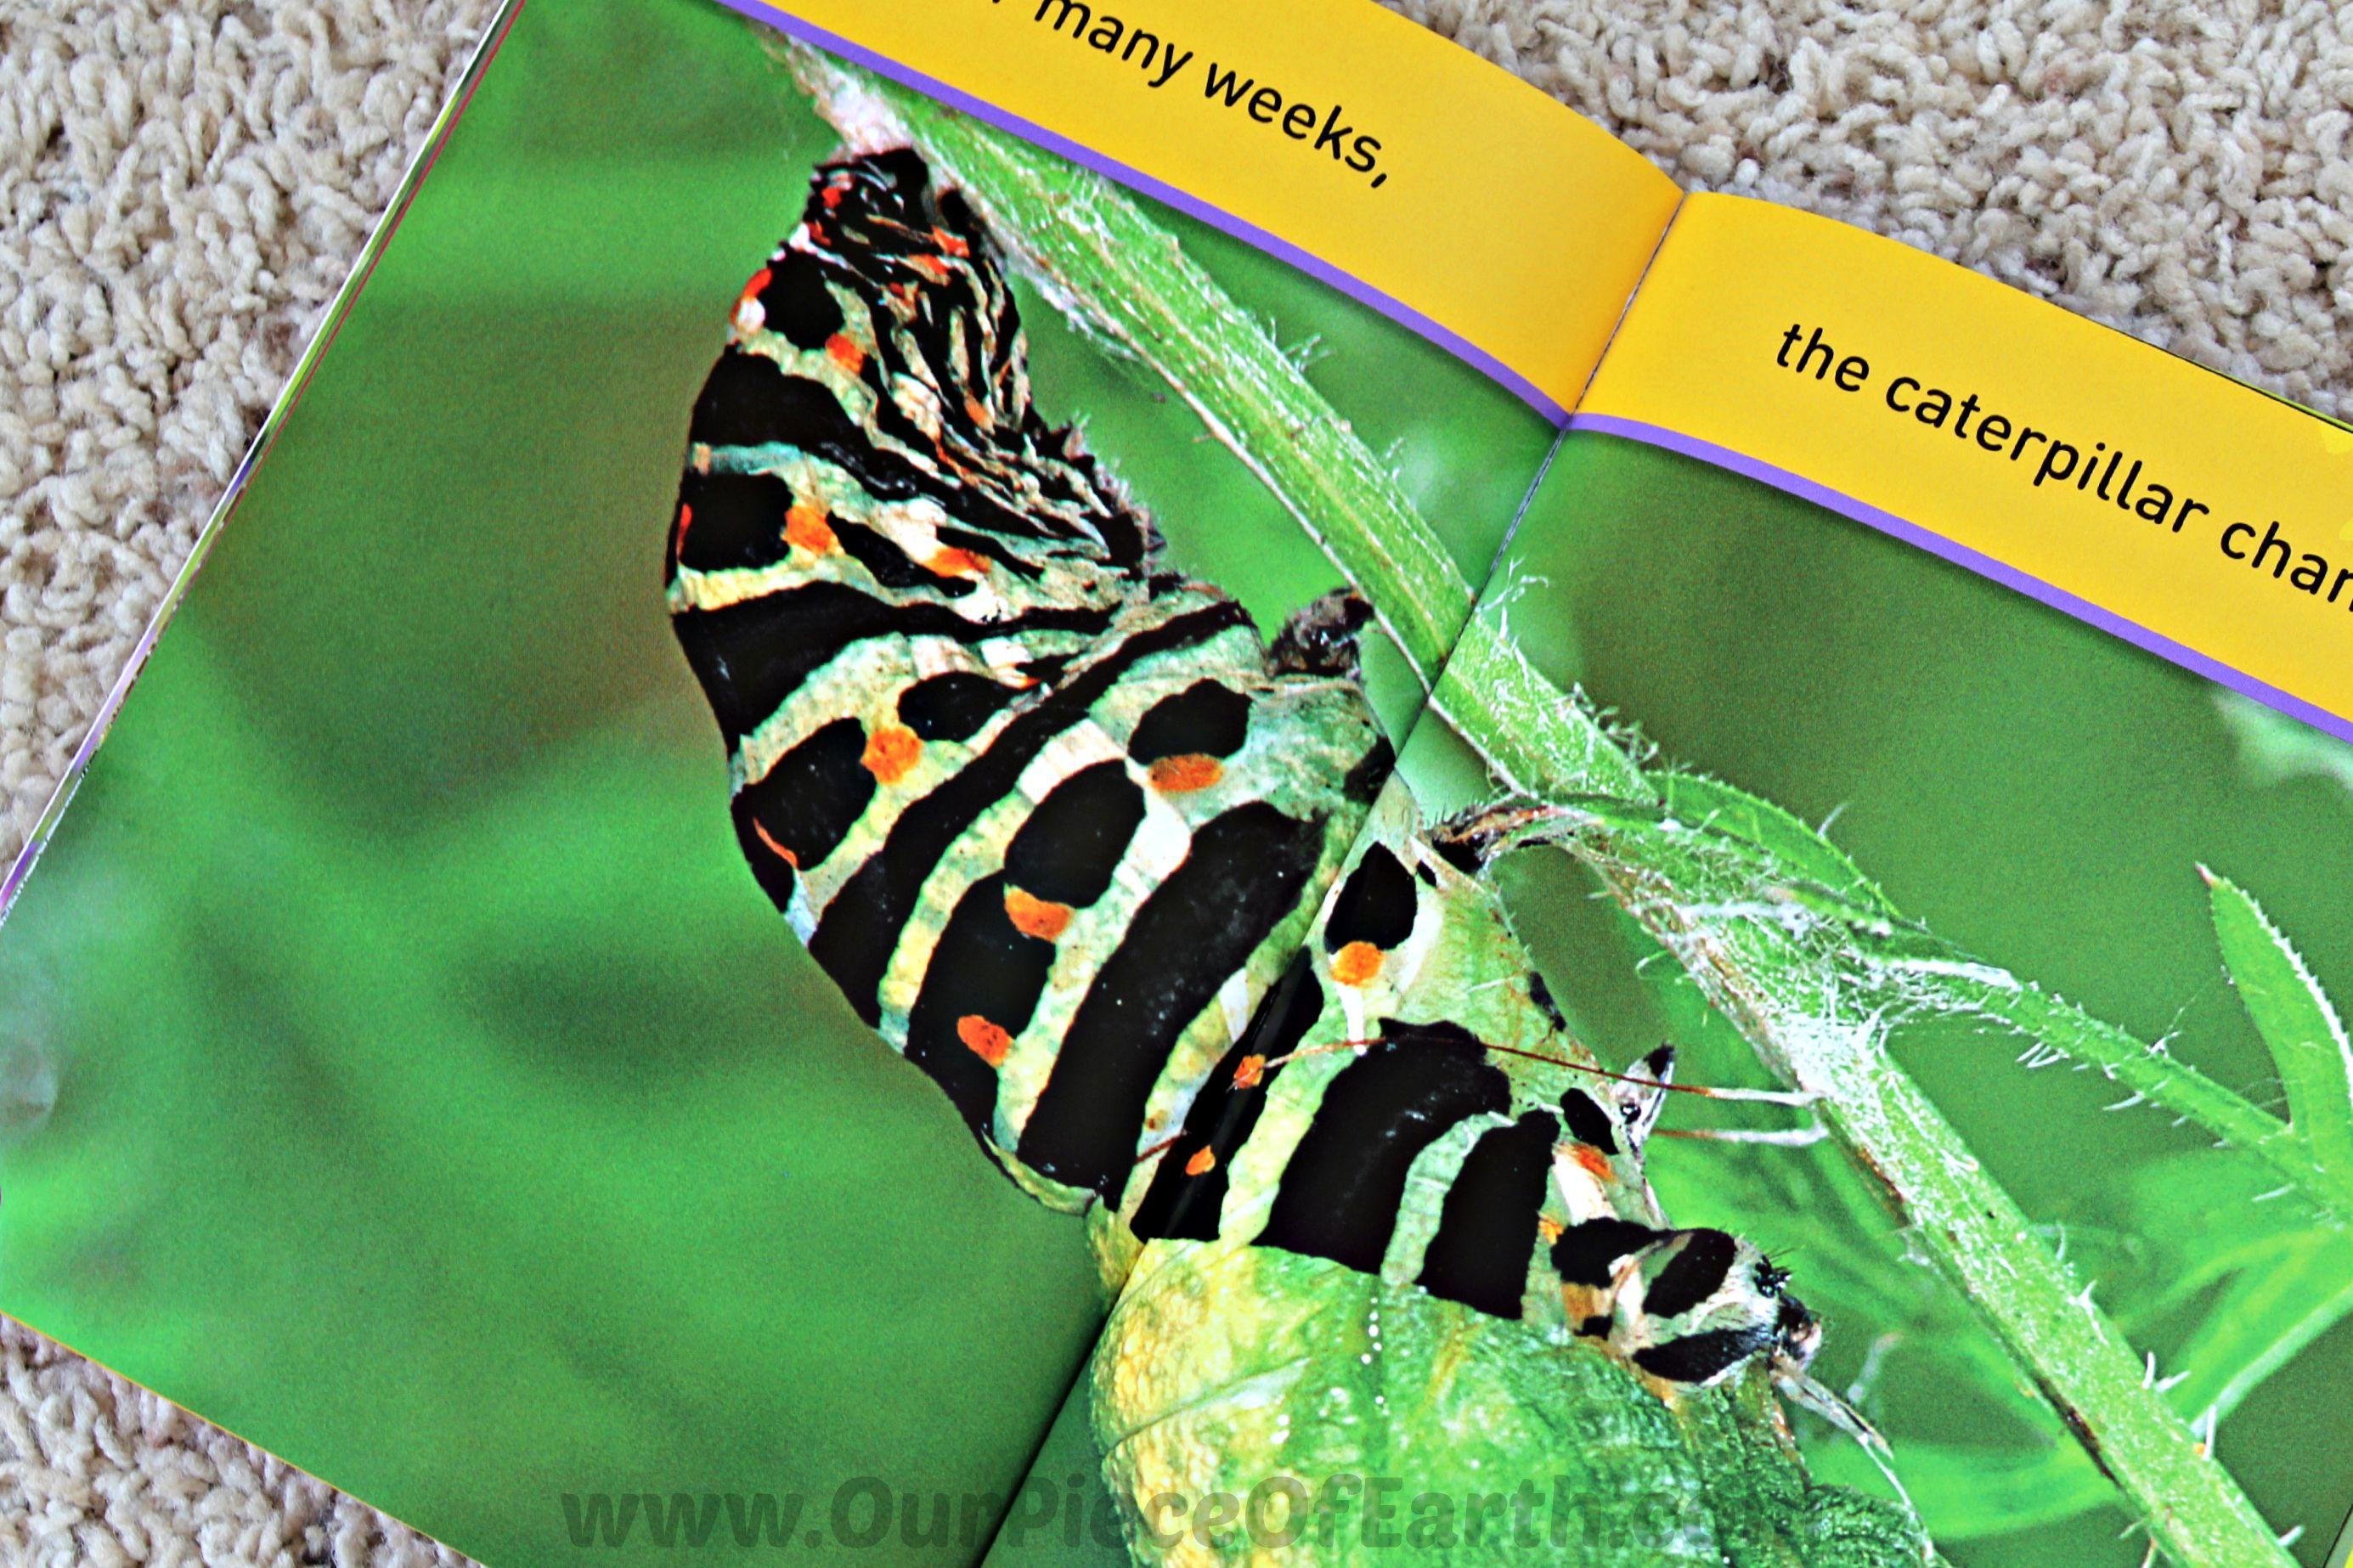 Caterpillar changing